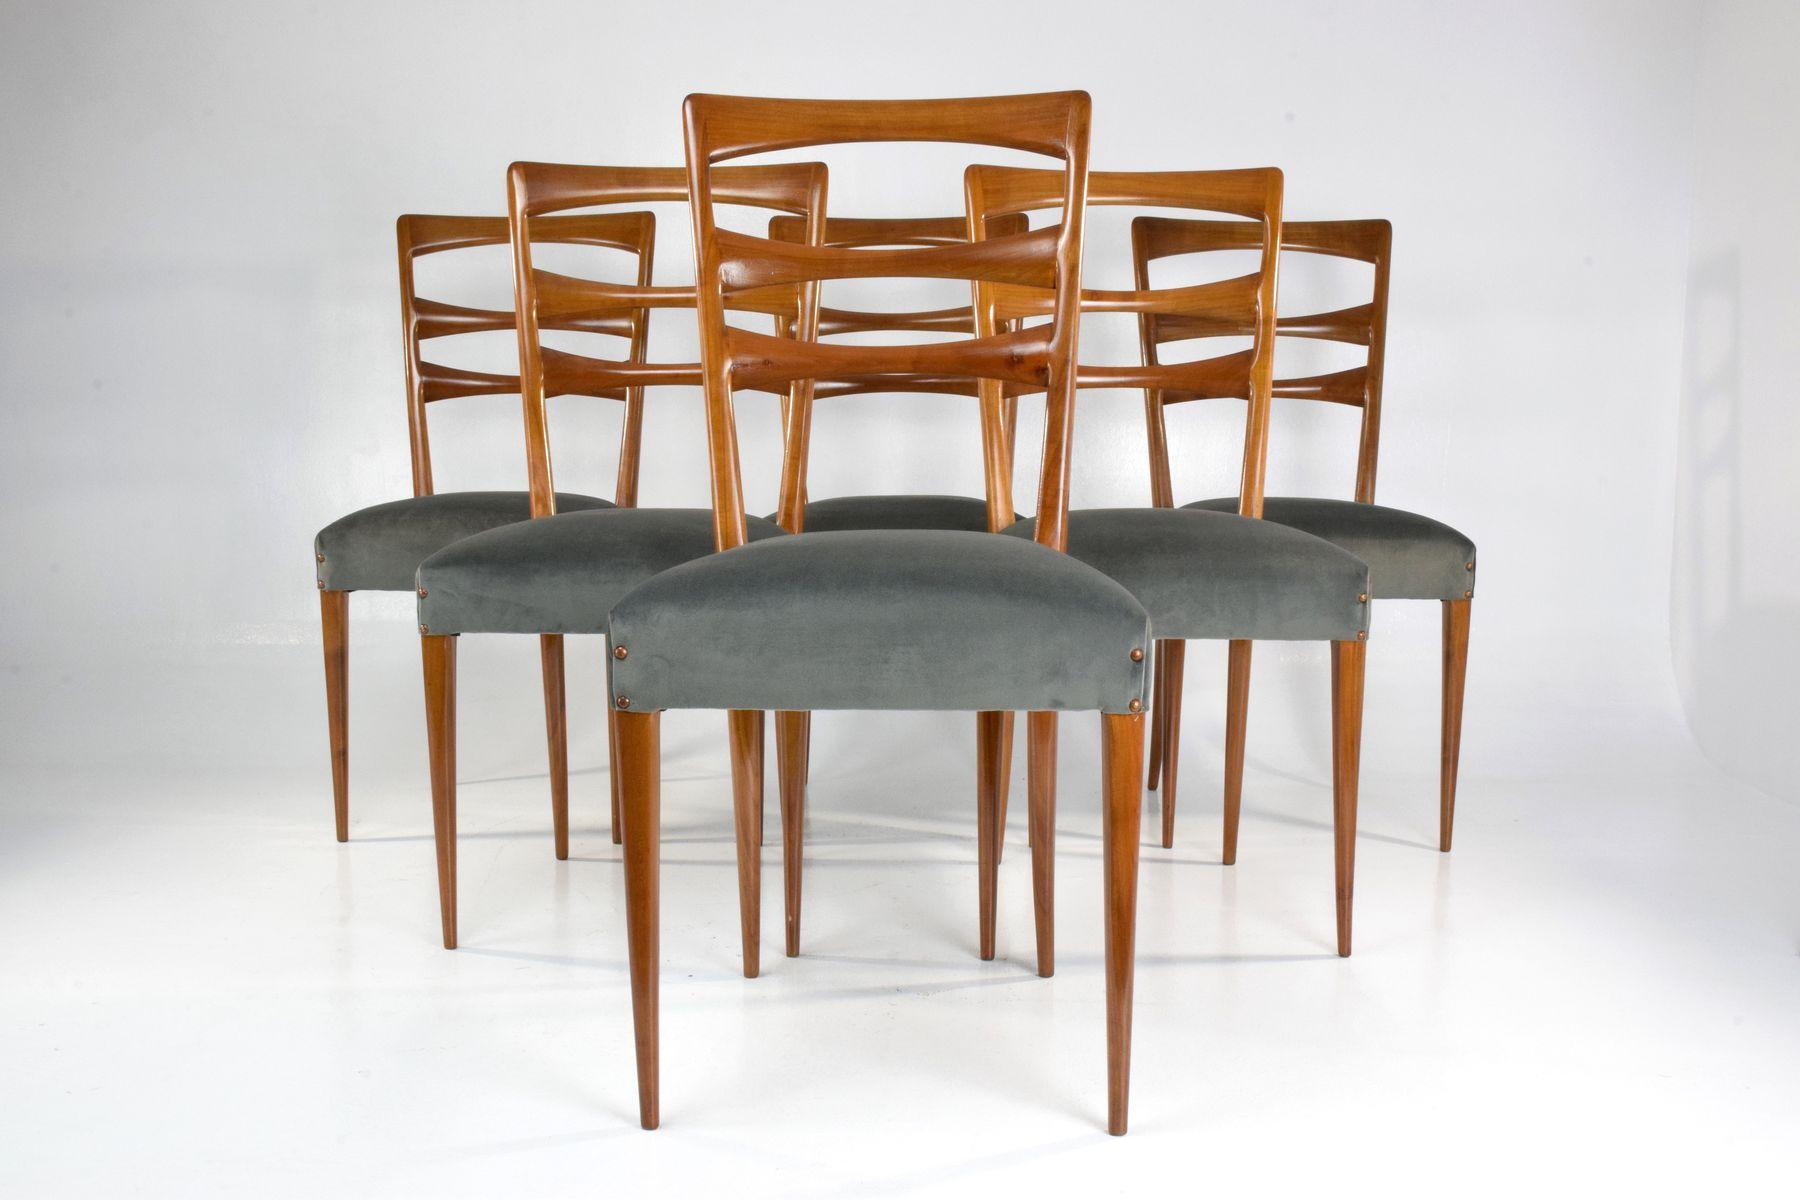 italienische esszimmerst hle mit samtbezug 1950er 6er. Black Bedroom Furniture Sets. Home Design Ideas